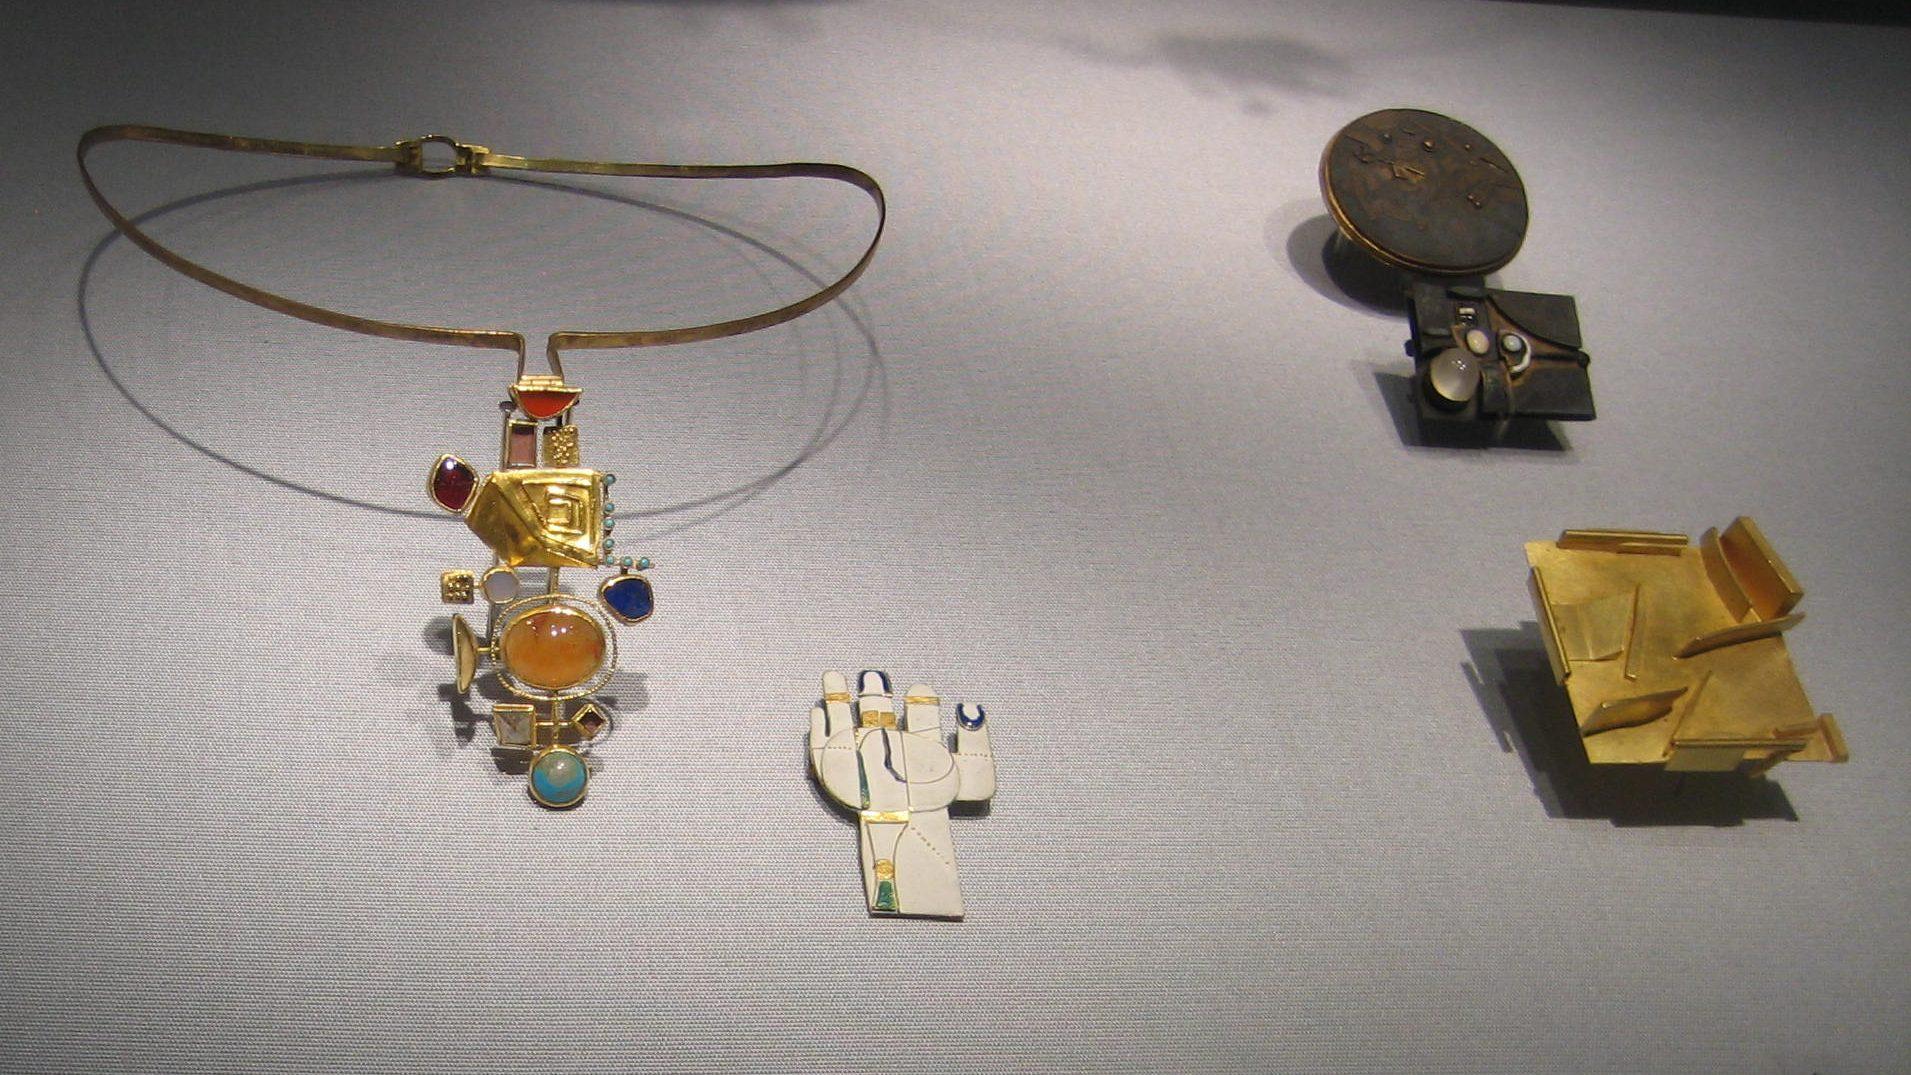 Hermann Jünger, halssieraad, 1963, broches, 1967, 1968, onbekend. Schmuckmuseum Pforzheim. Foto Esther Doornbusch, mei 2019, goud, zilver, email, maansteen